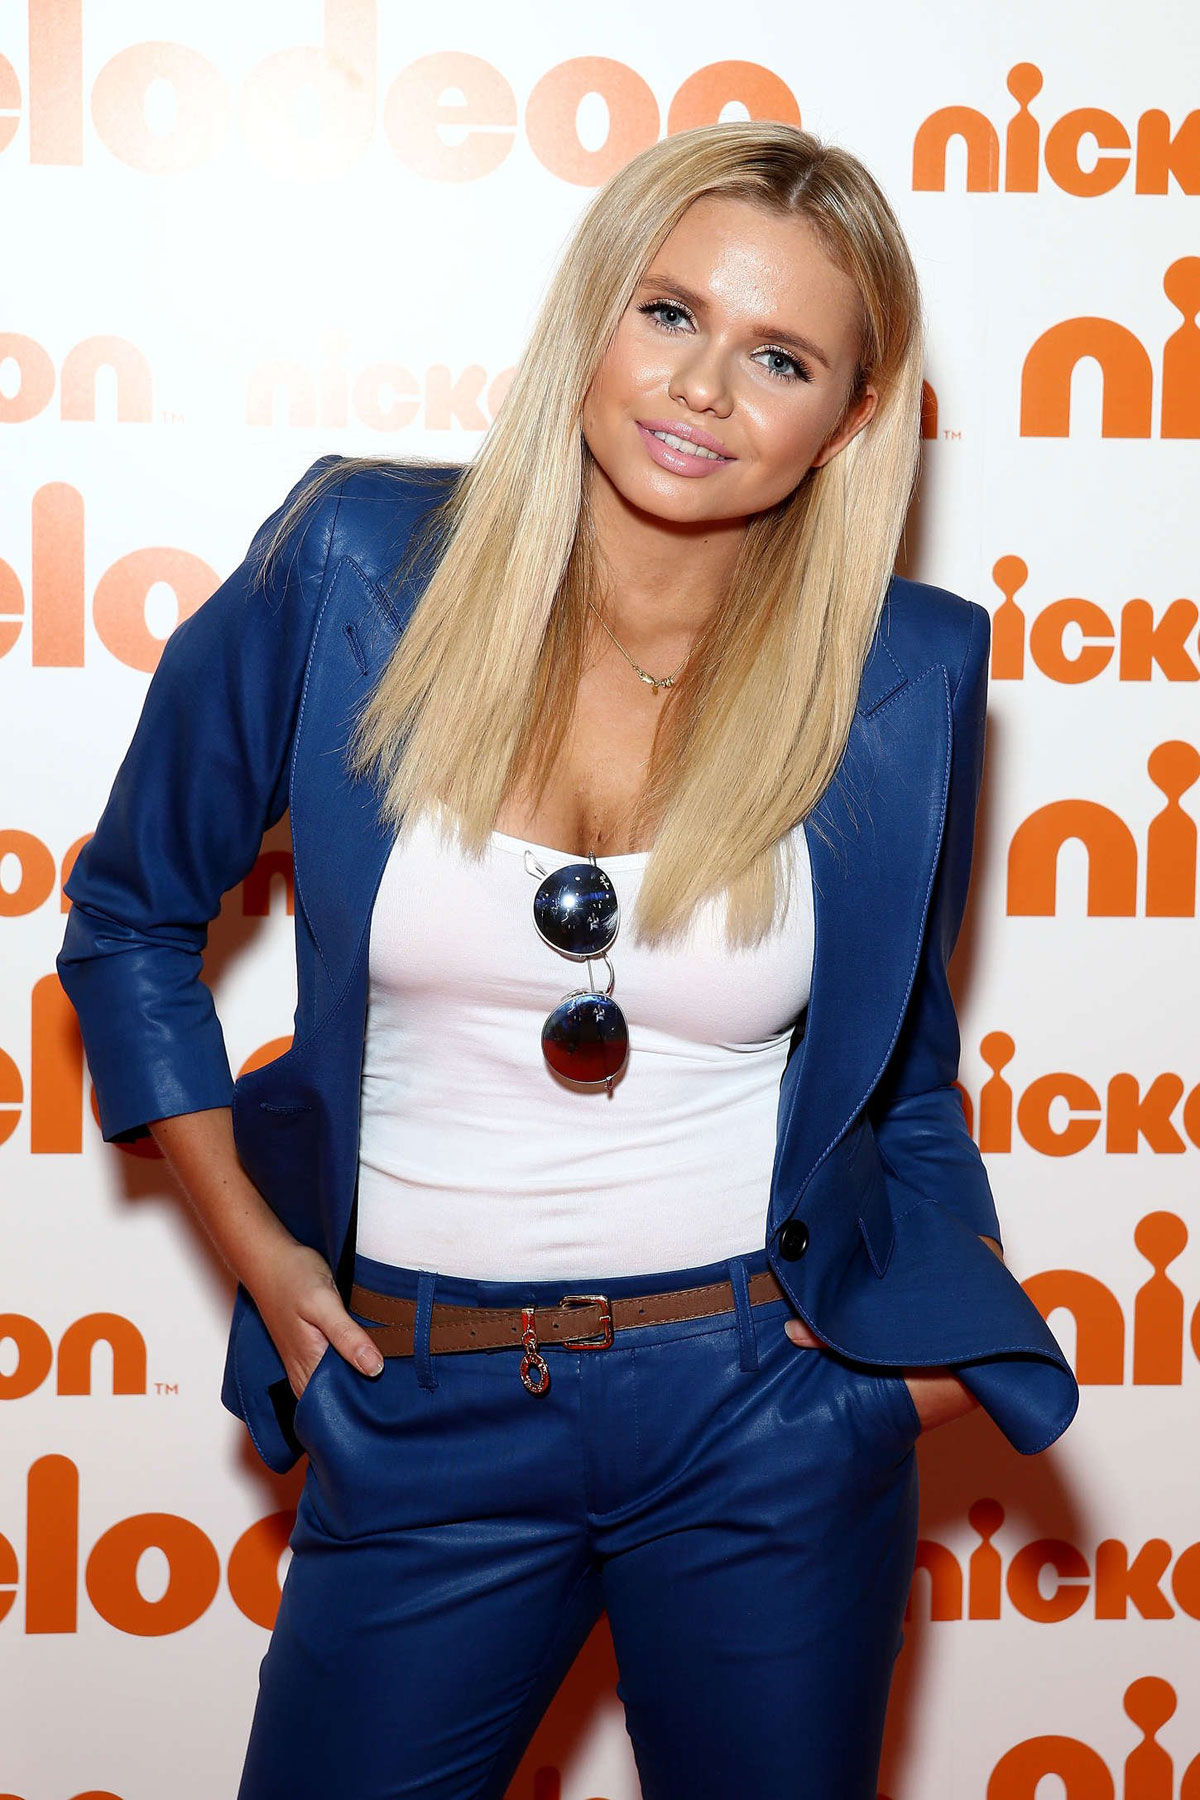 Alli Simpson attends Nickelodeon Slimefest 2014 matinee show